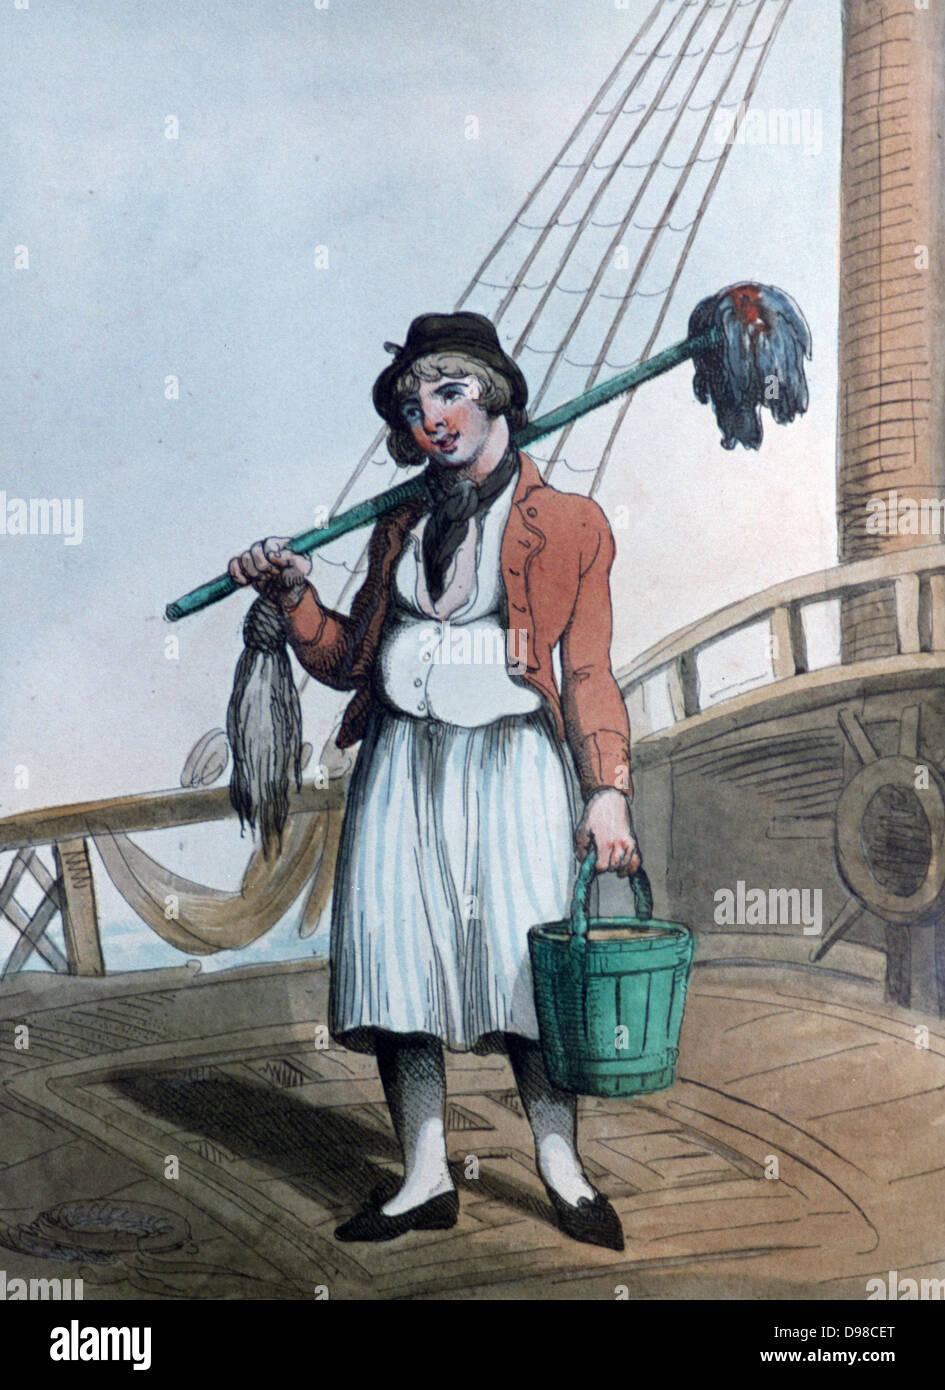 Cabin Boy', 1799. Print by Thomas Rowlandson (1756-1827). Aquatint. - Stock Image